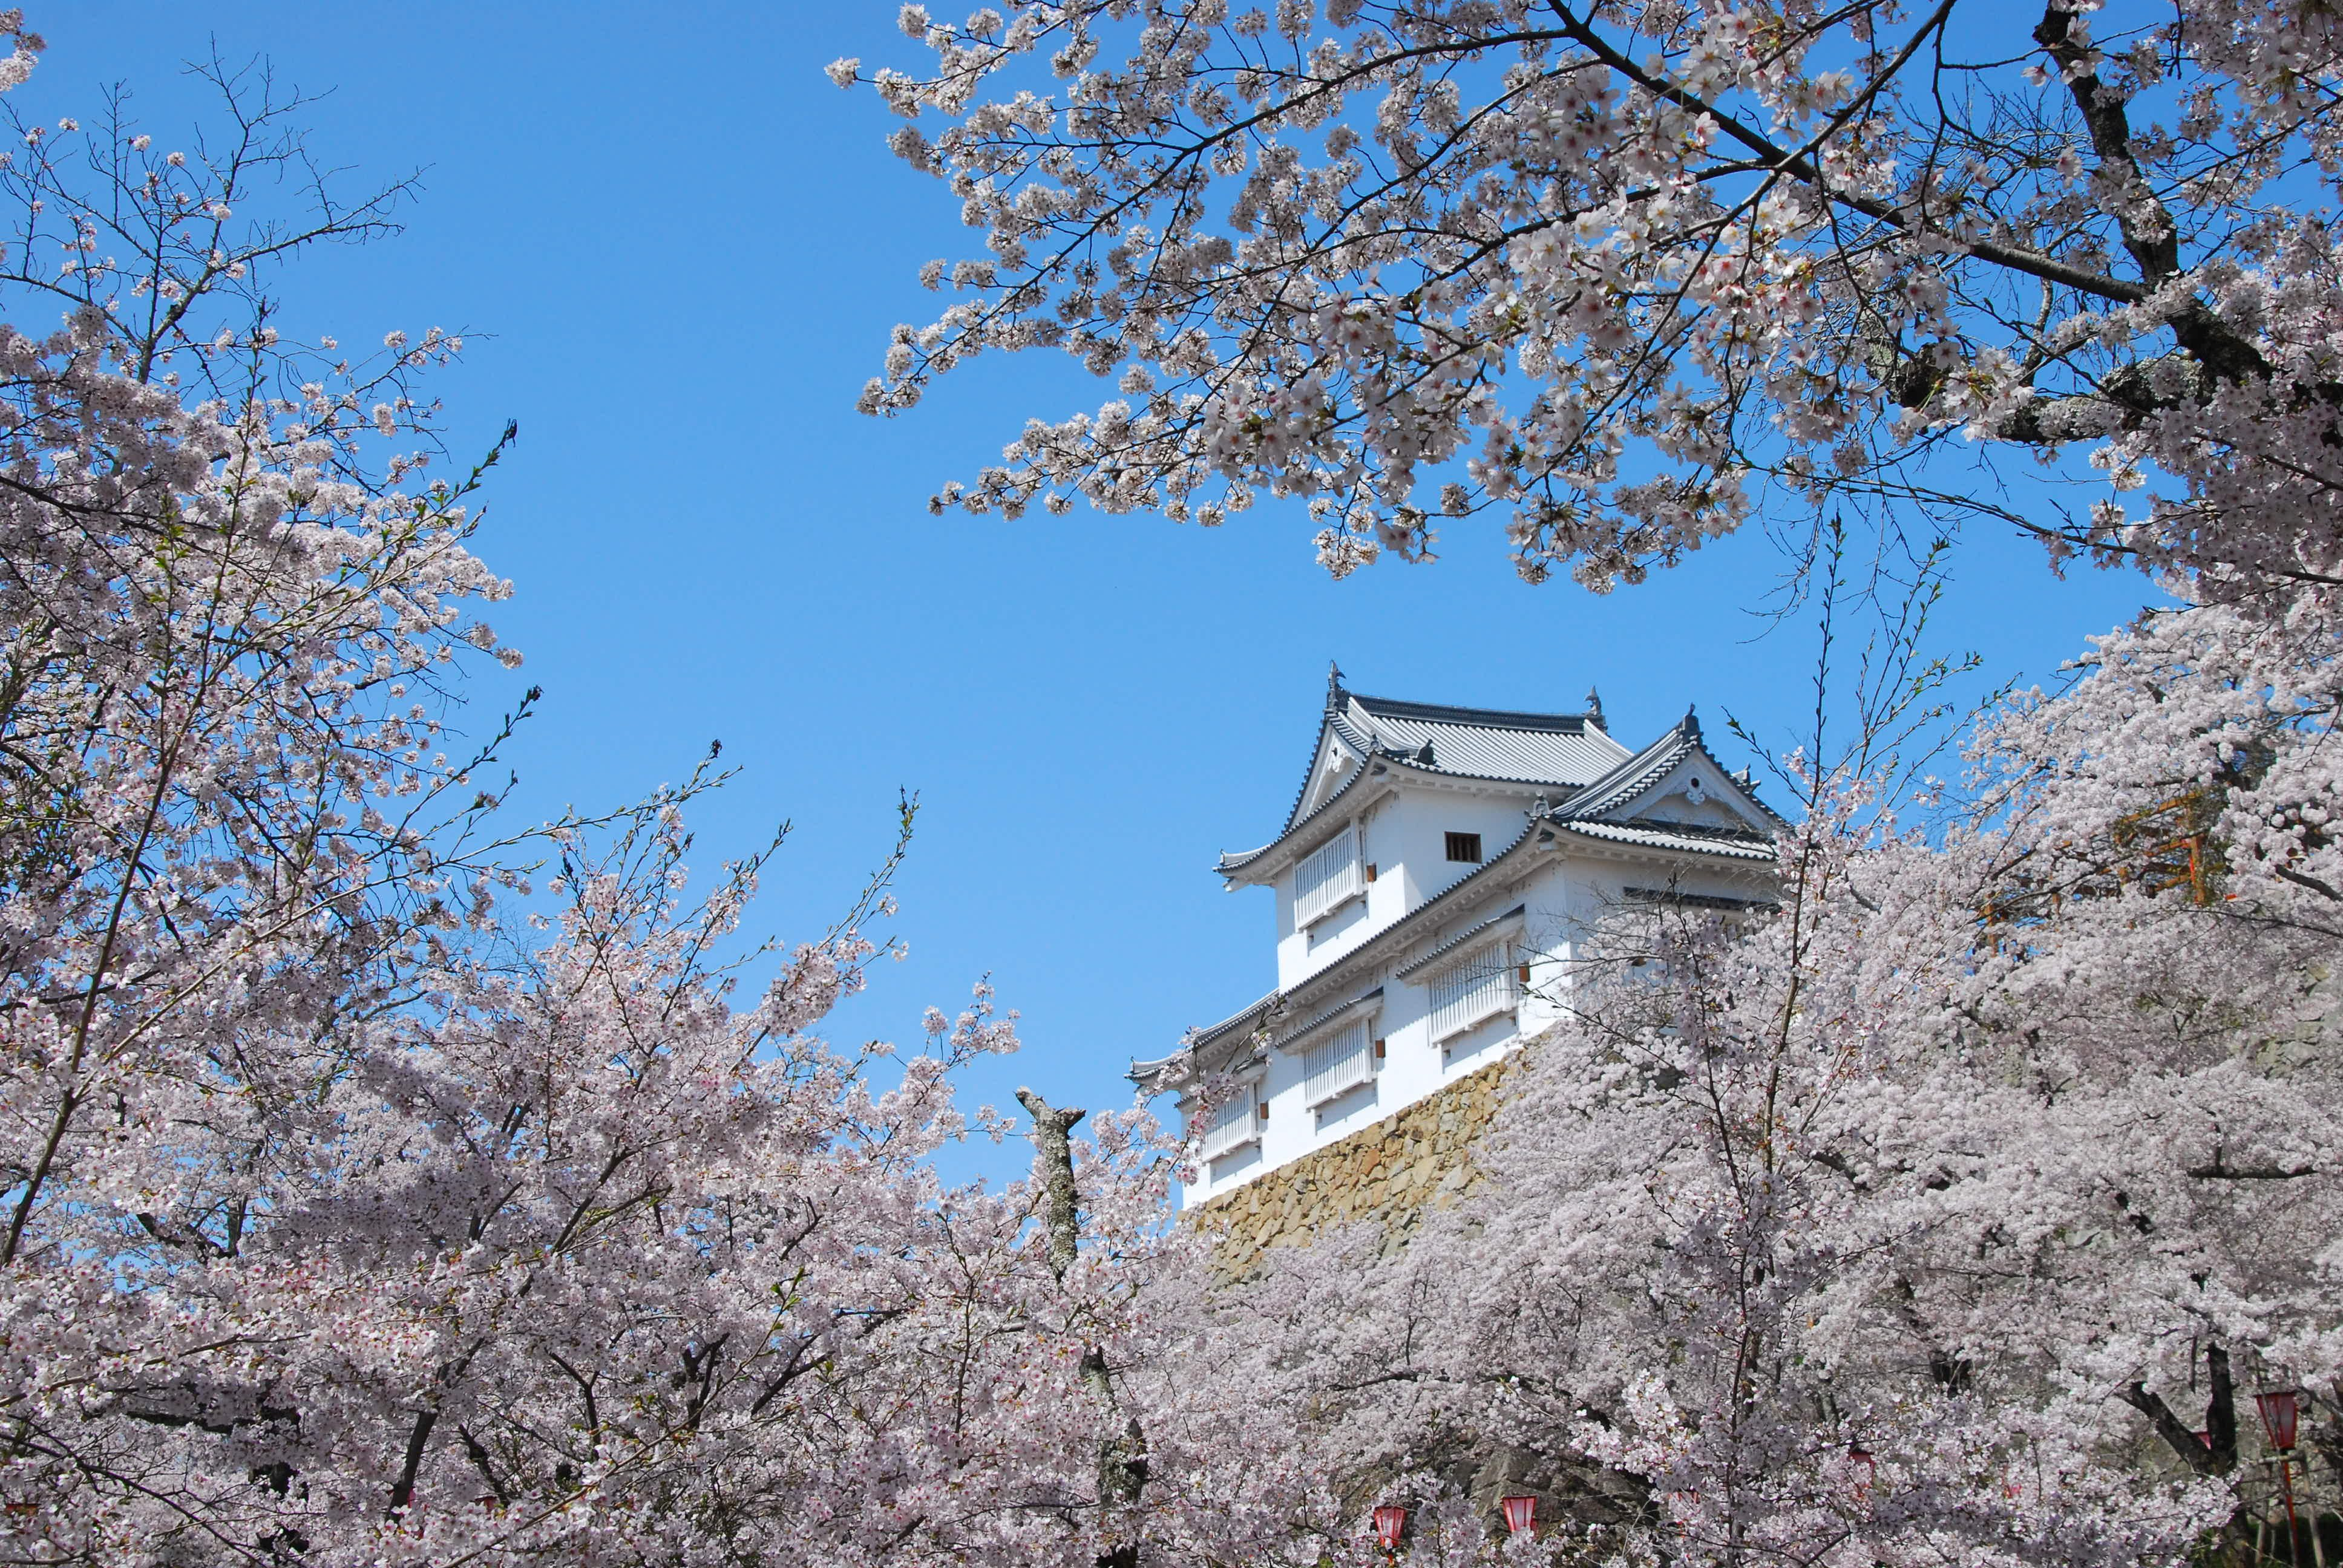 津山城 備中櫓と桜.jpg